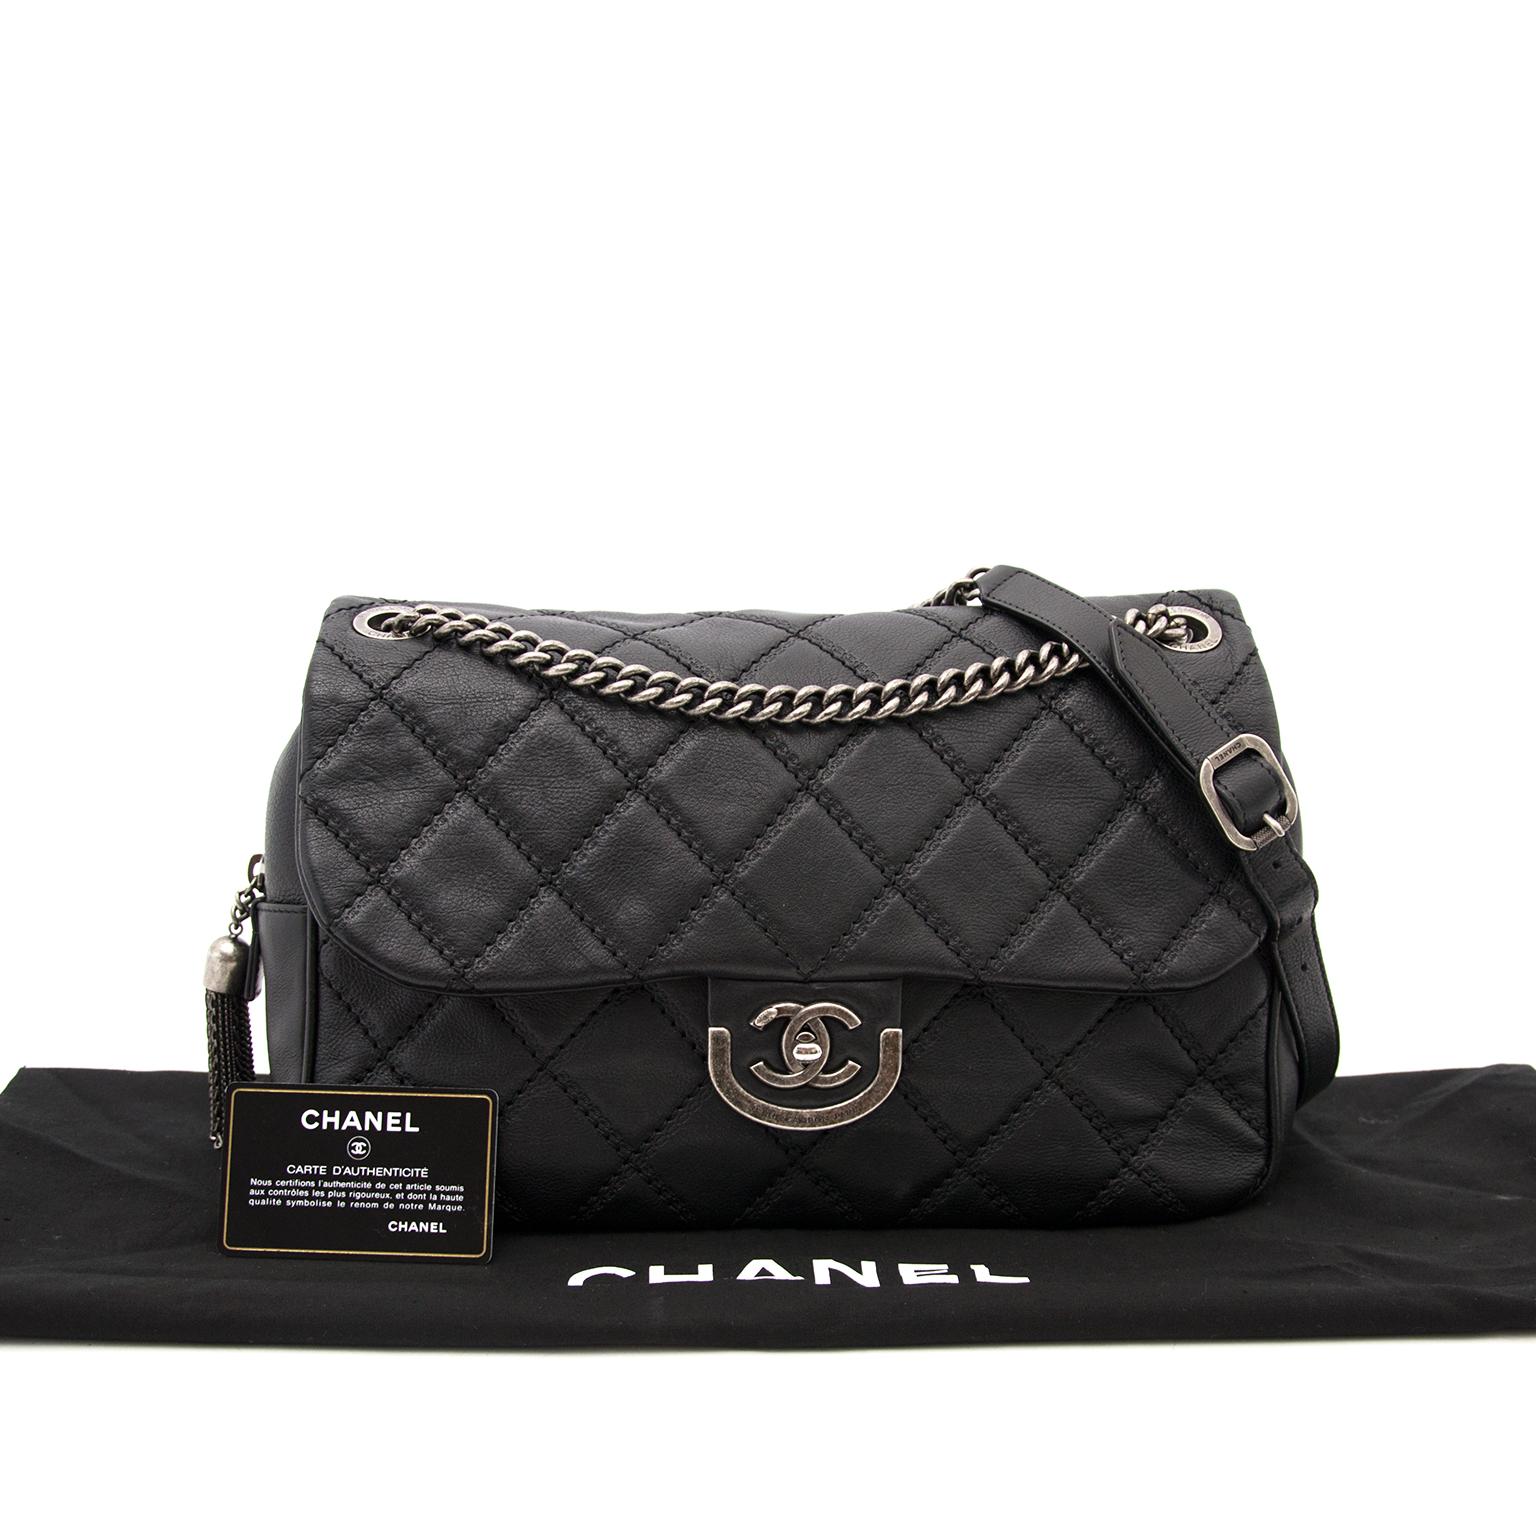 2ccf276b3ae8 Labellov Shop safe online: authentic vintage Chanel clothes, bags ...